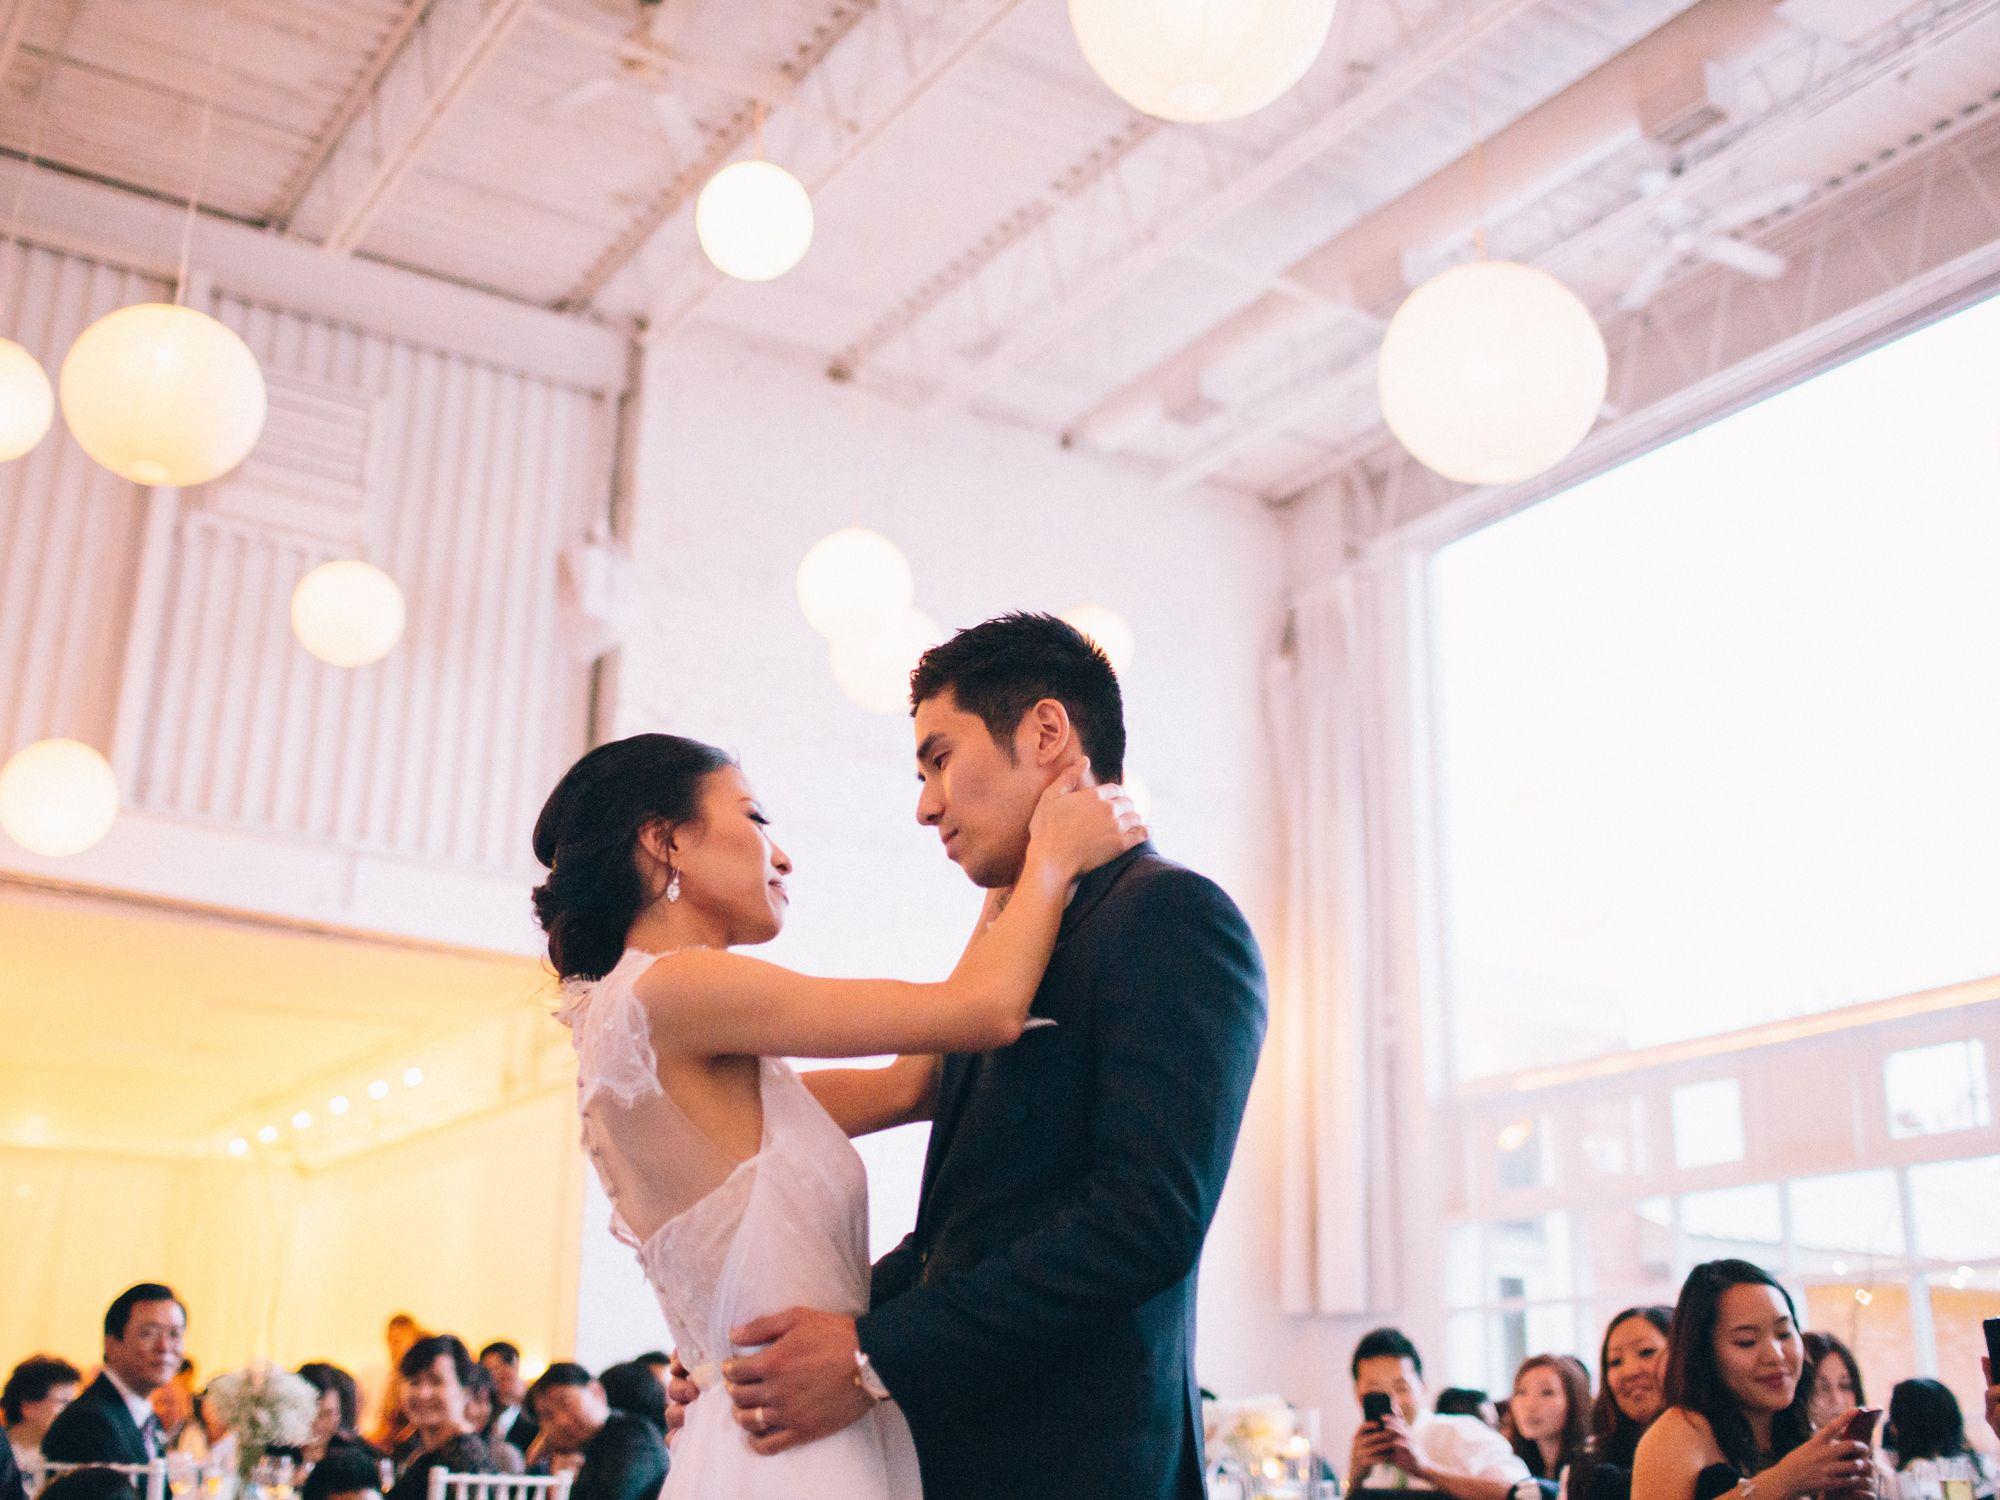 Romantic songs for dance